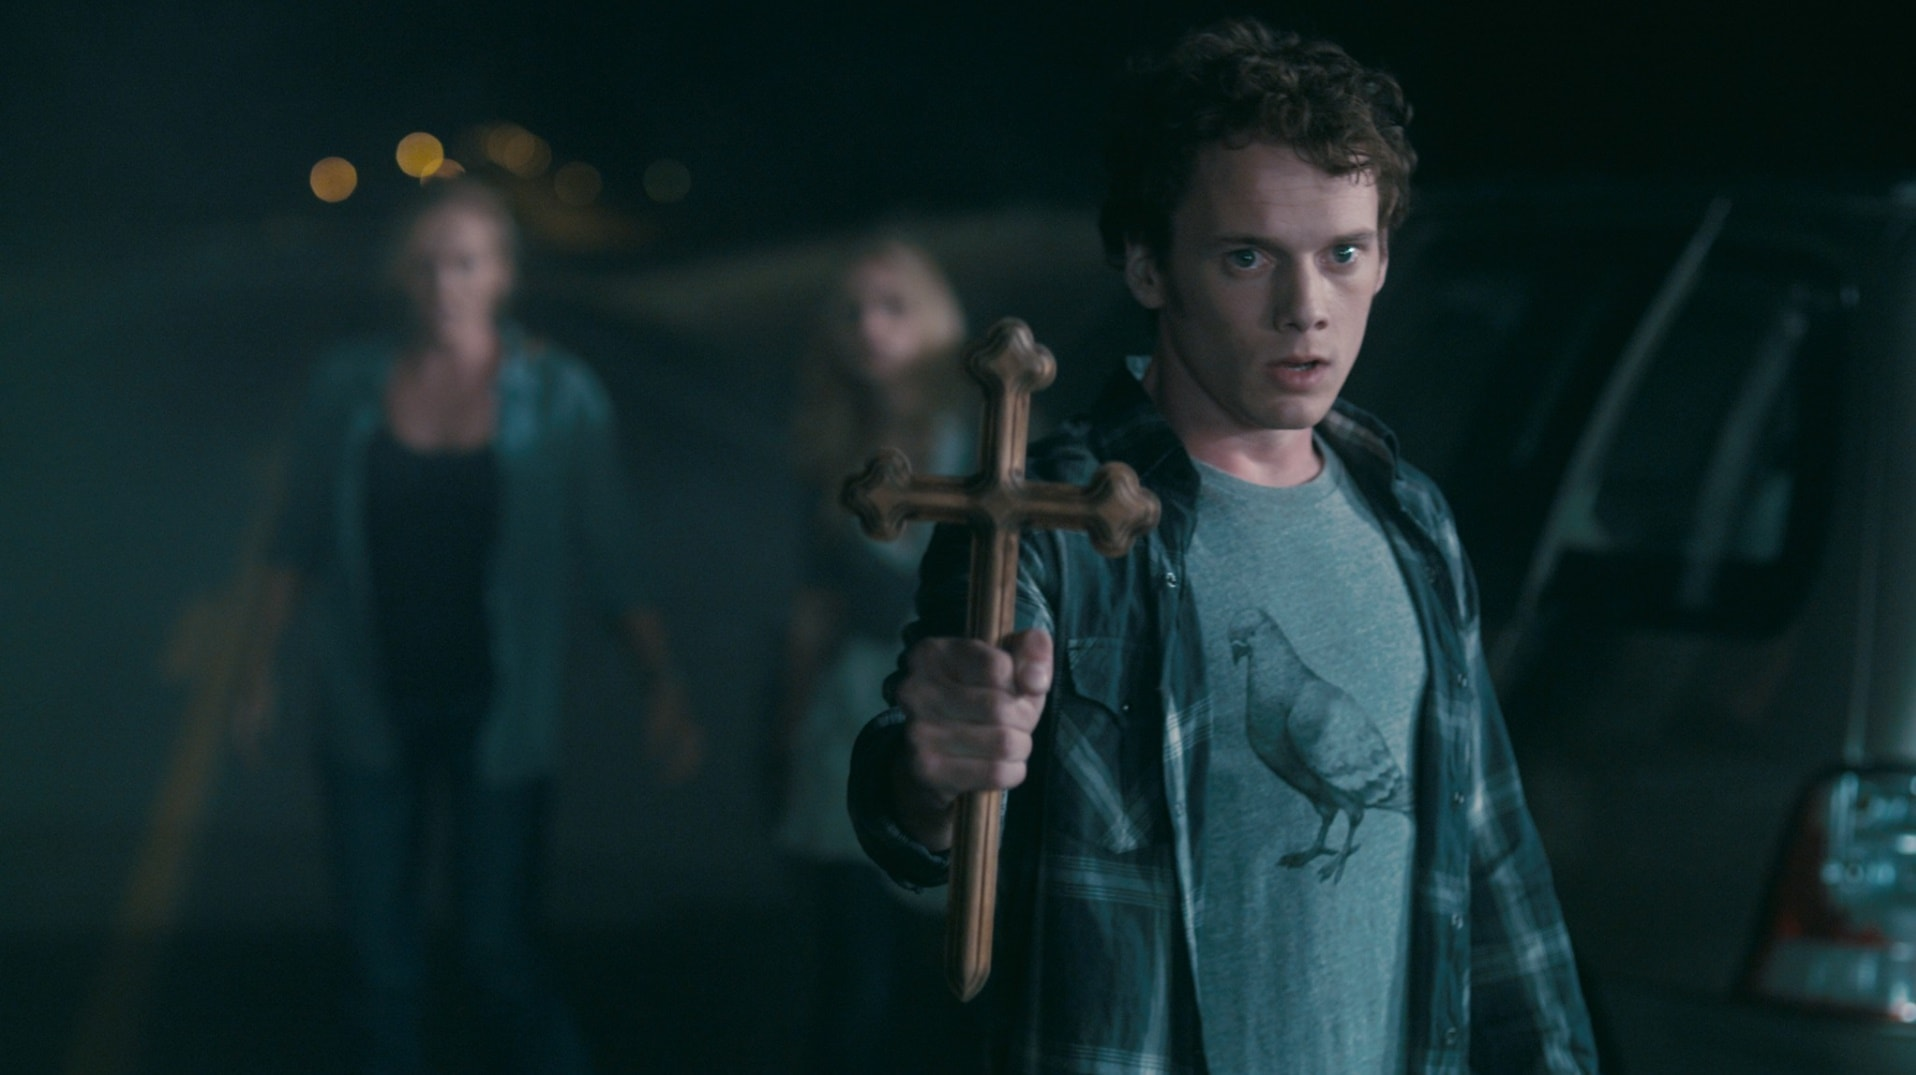 Ночь страха / Fright Night (2011): кадр из фильма